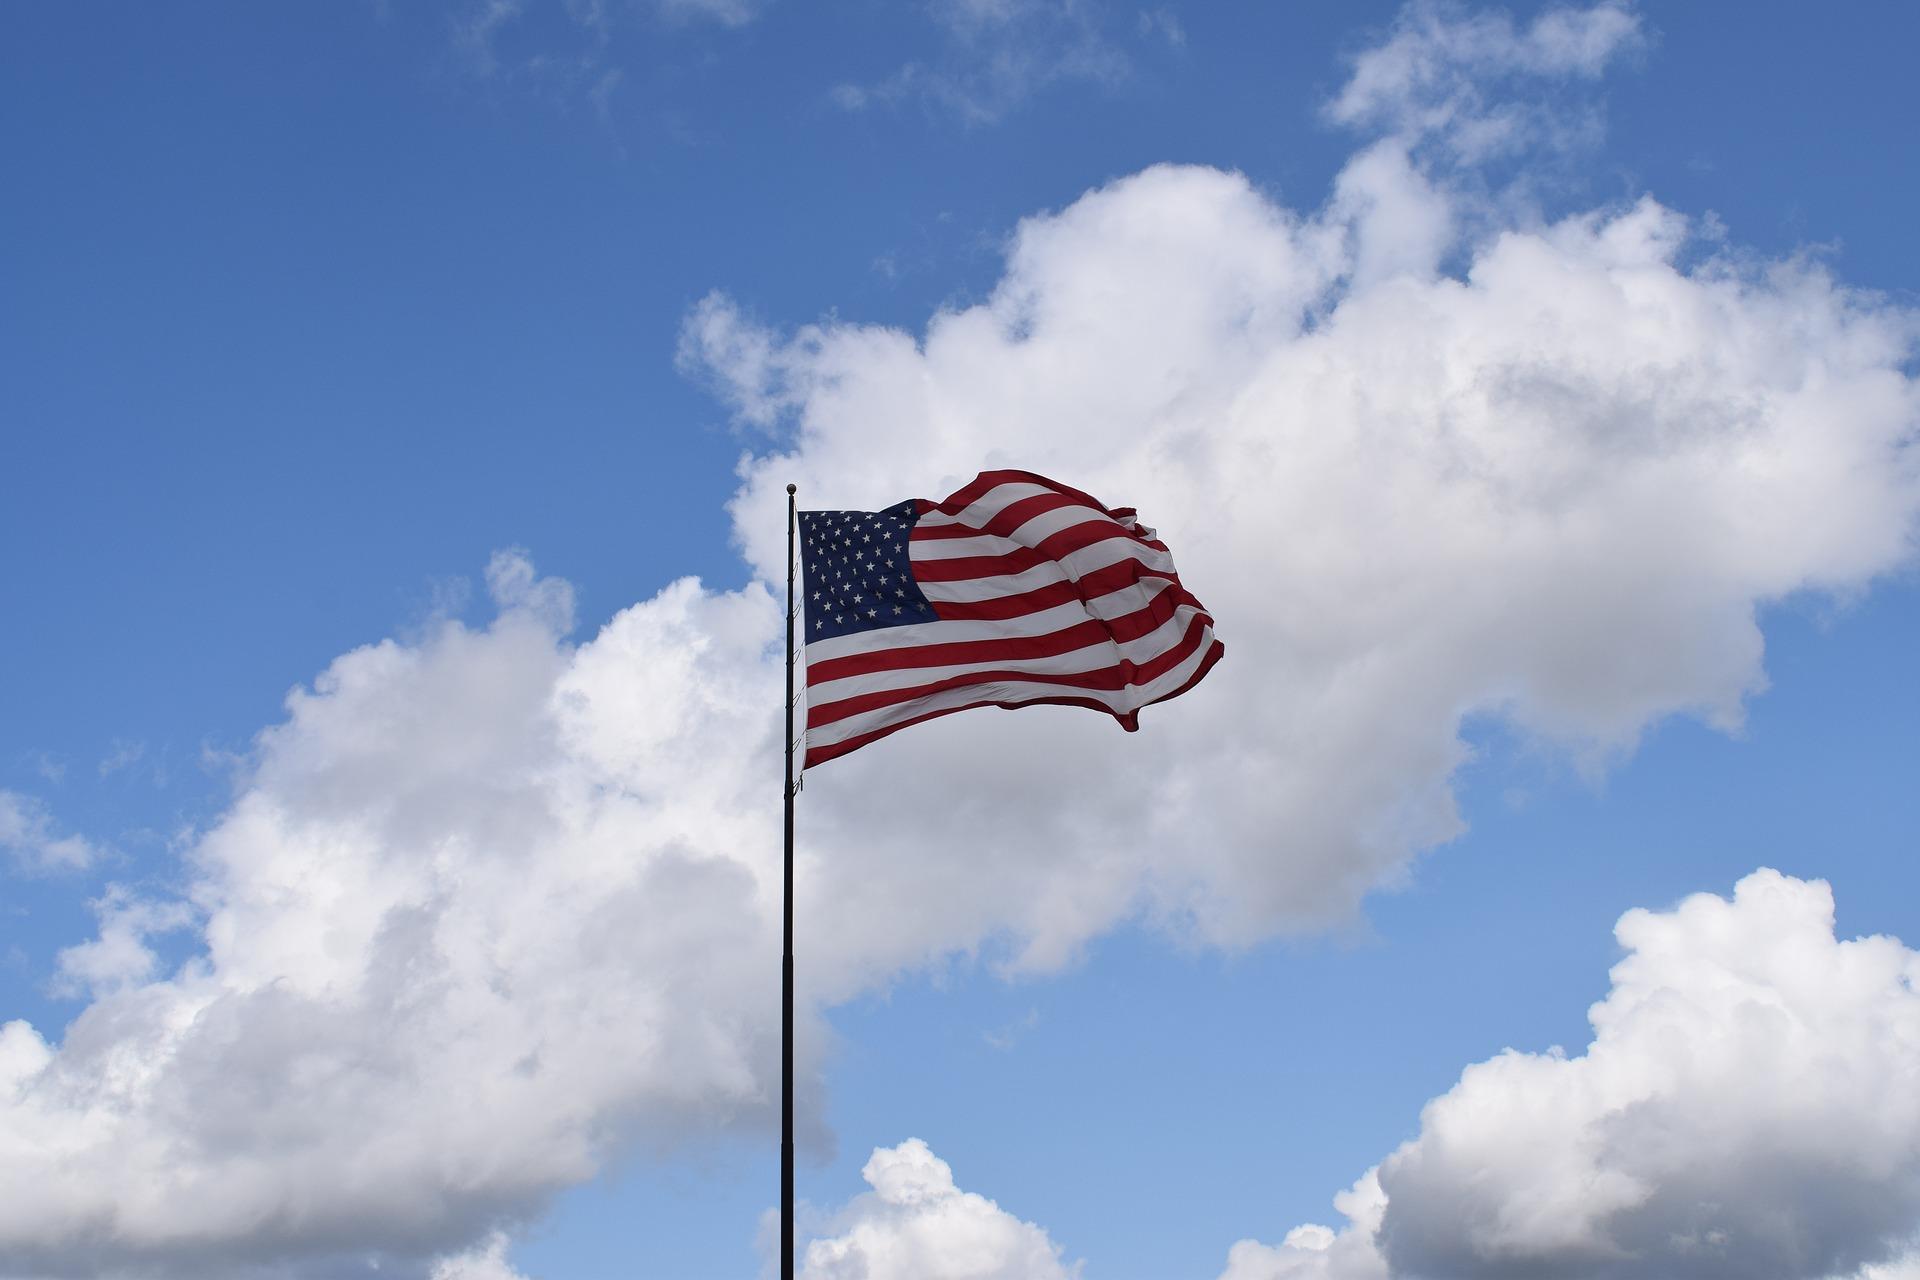 american-flag-3678258_1920 (2).jpg